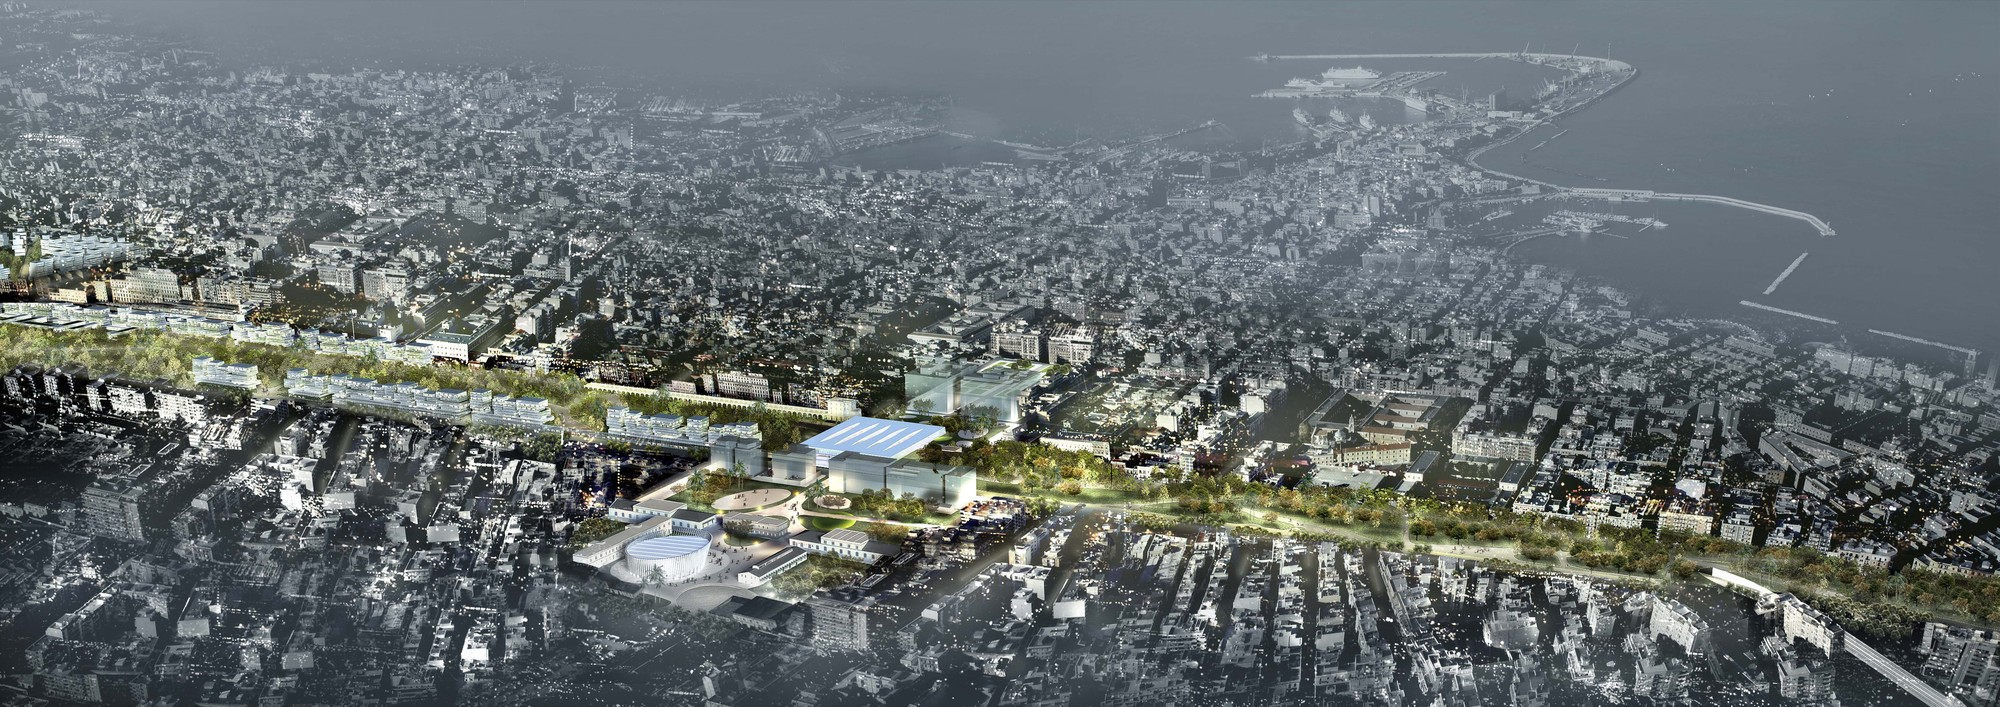 Massimiliano and Doriana Fuksas Wins Competition To Create 'Greenest City in Italy', © Studio Fuksas